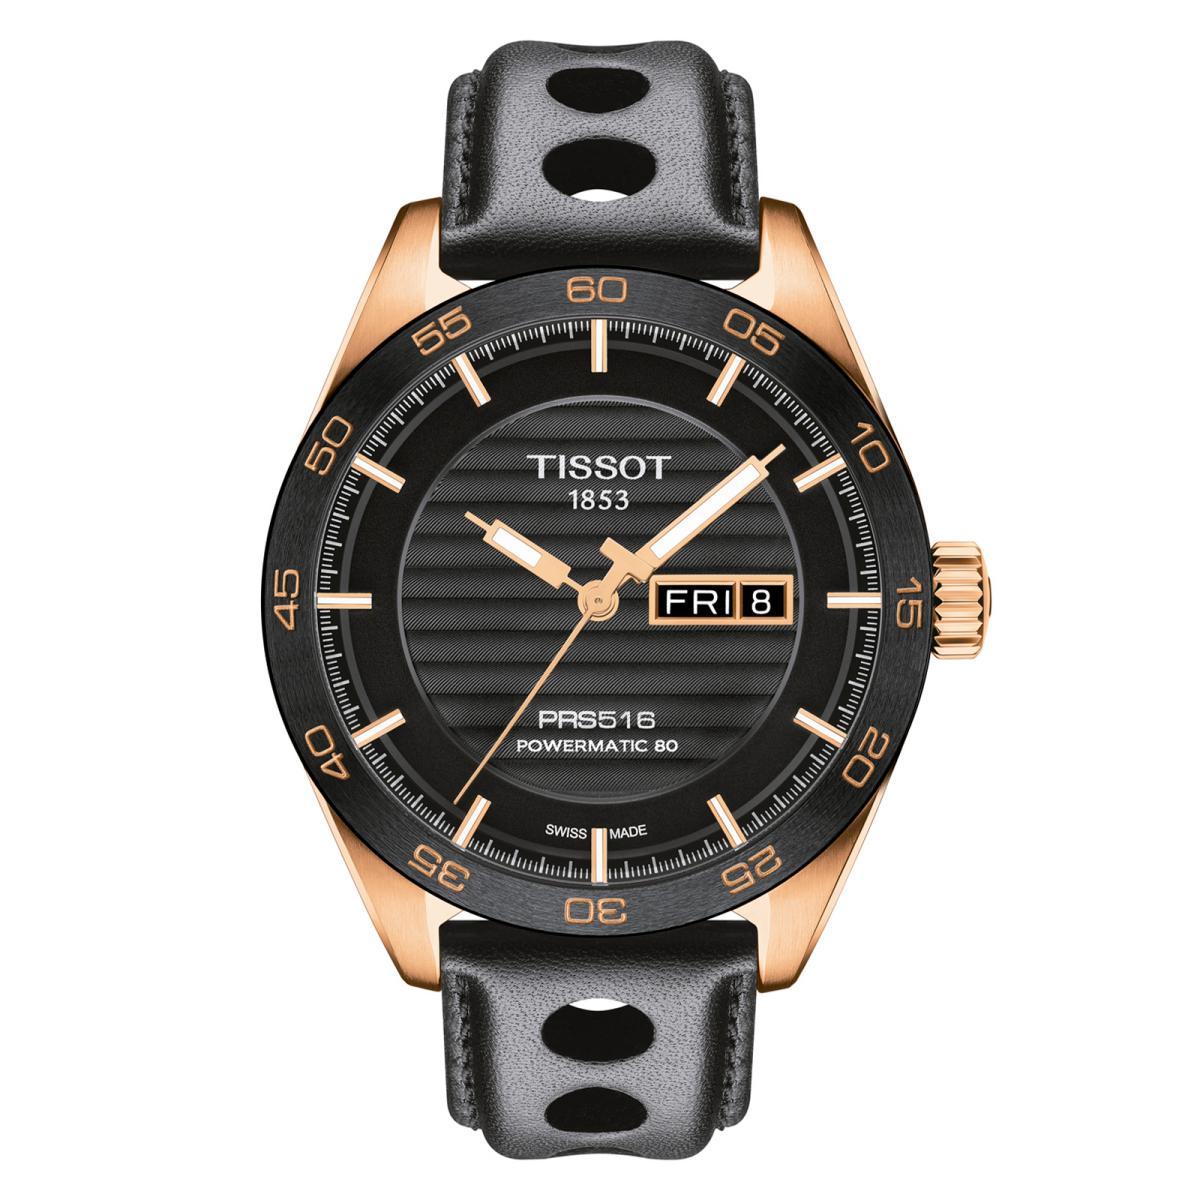 42f261b53e54 Reloj Tissot - T100.430.36.051.00 - HOMBRE - Time Square